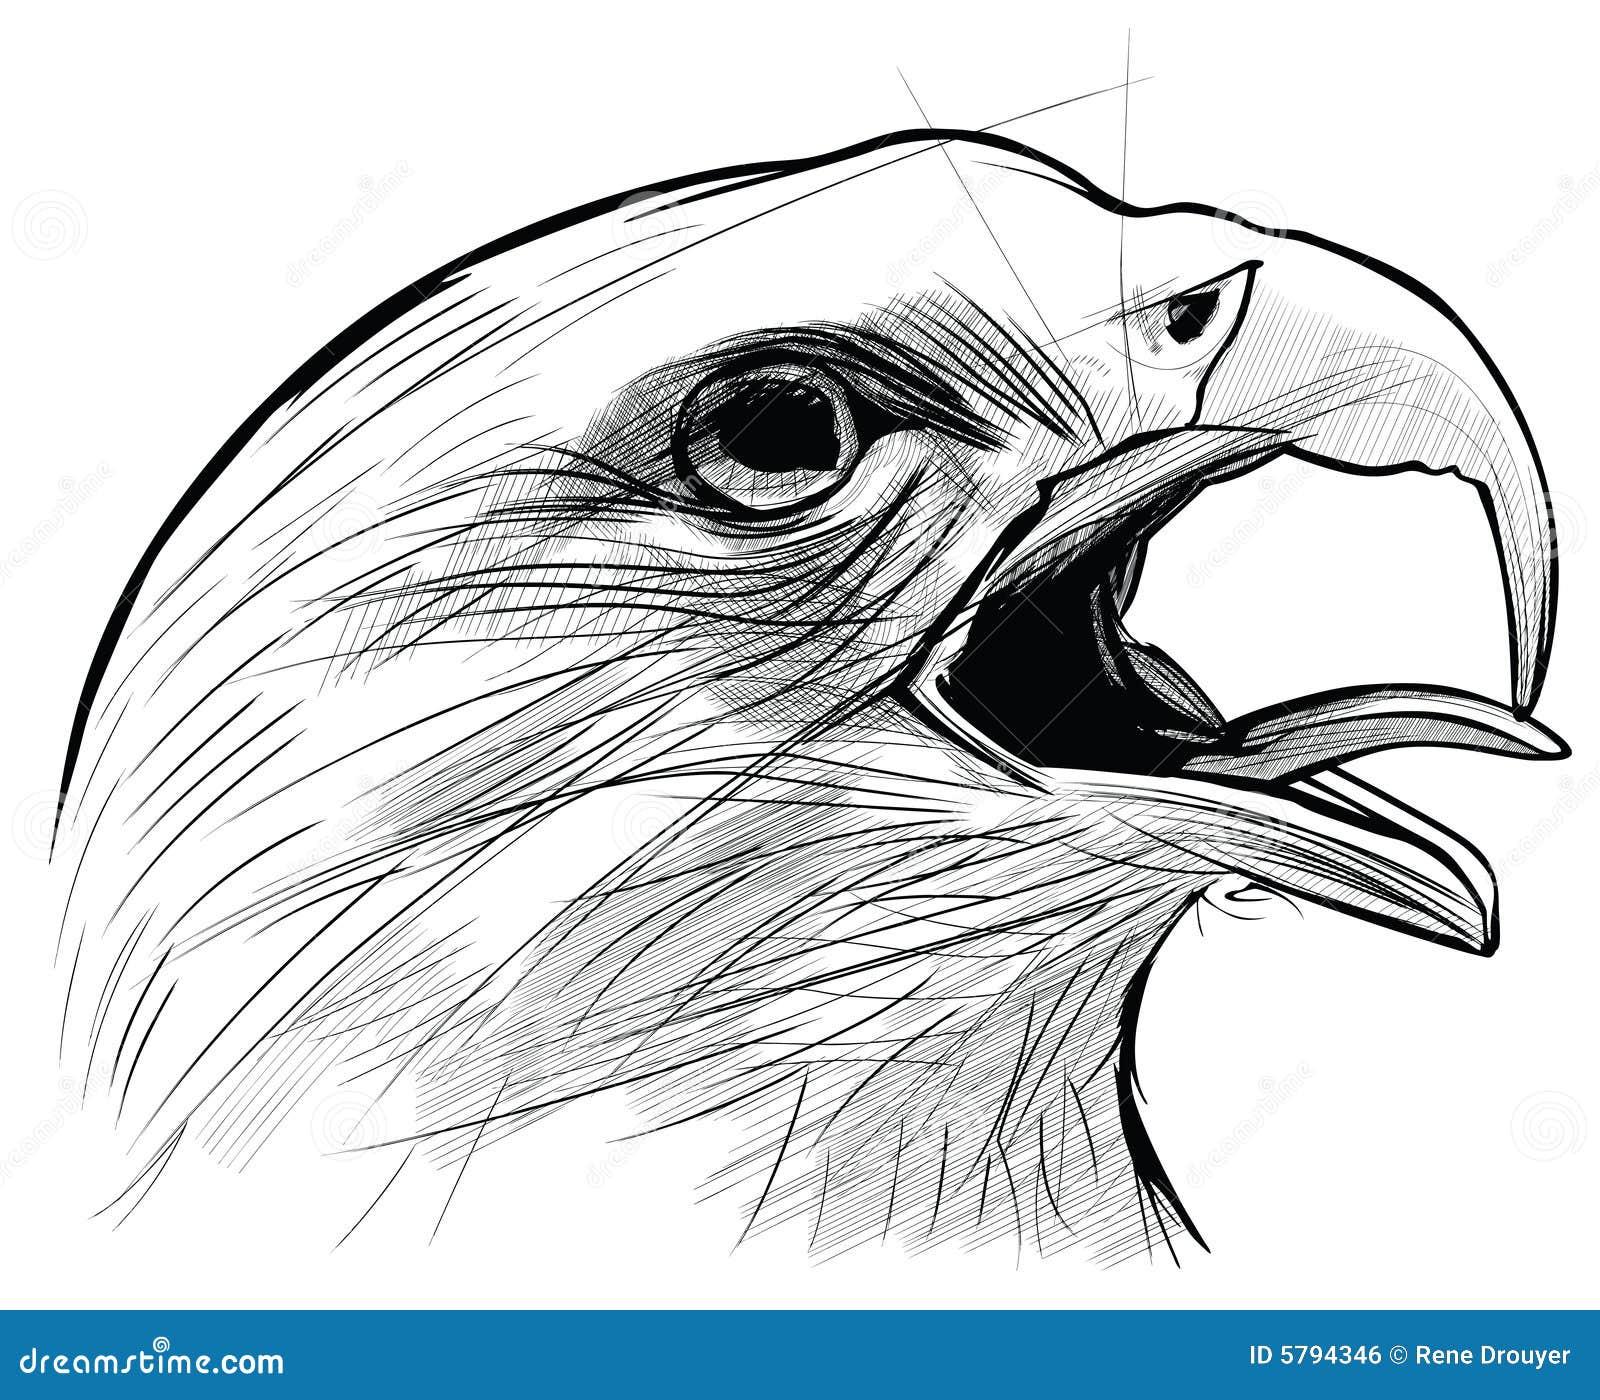 ink drawing of langkawi eagle royalty free stock image